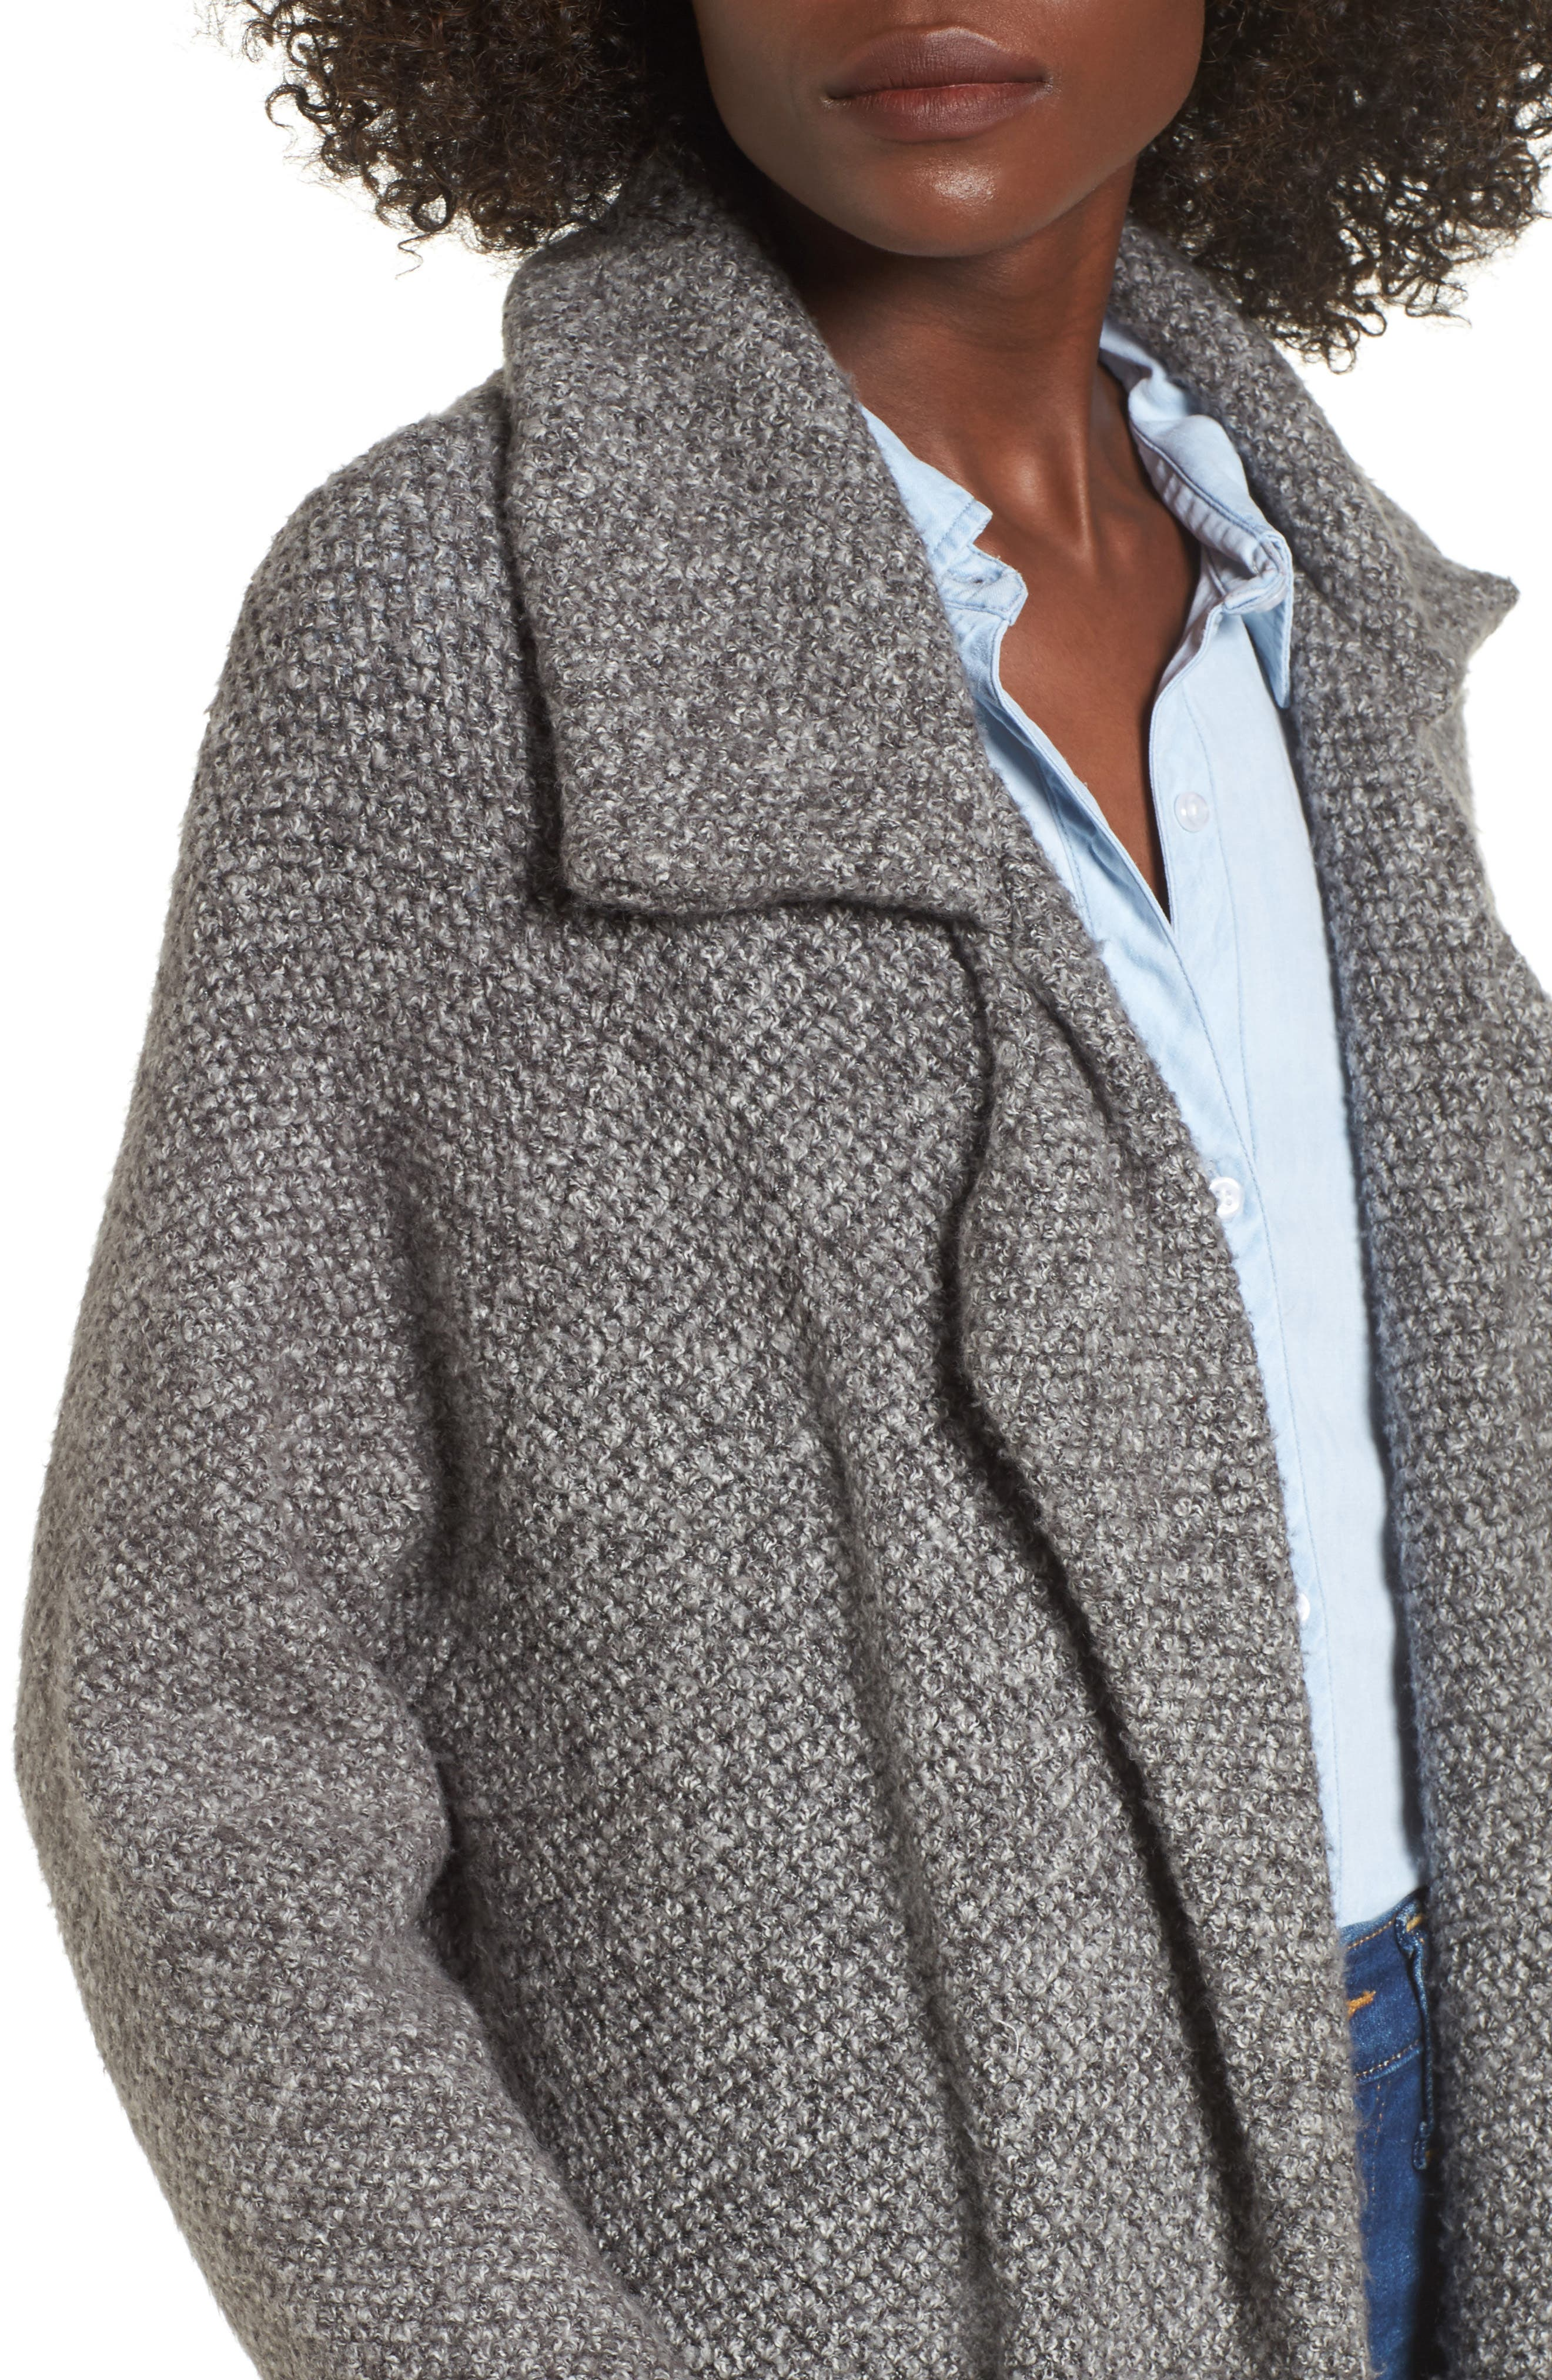 Kala Knit Sweater Jacket,                             Alternate thumbnail 4, color,                             030